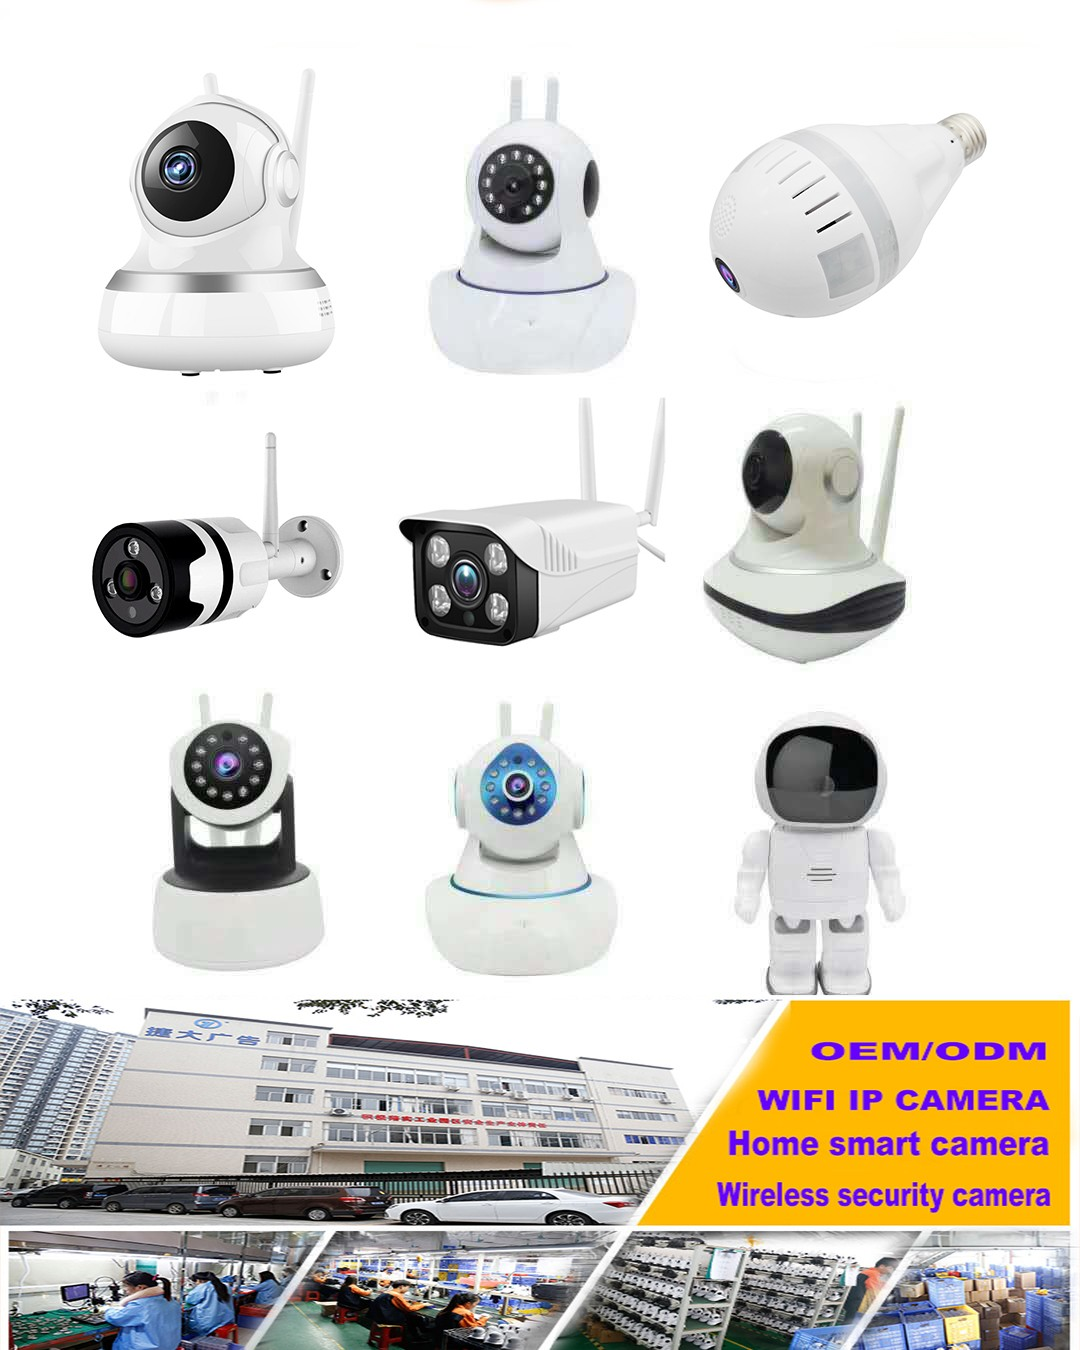 wireless security camera factory.jpg